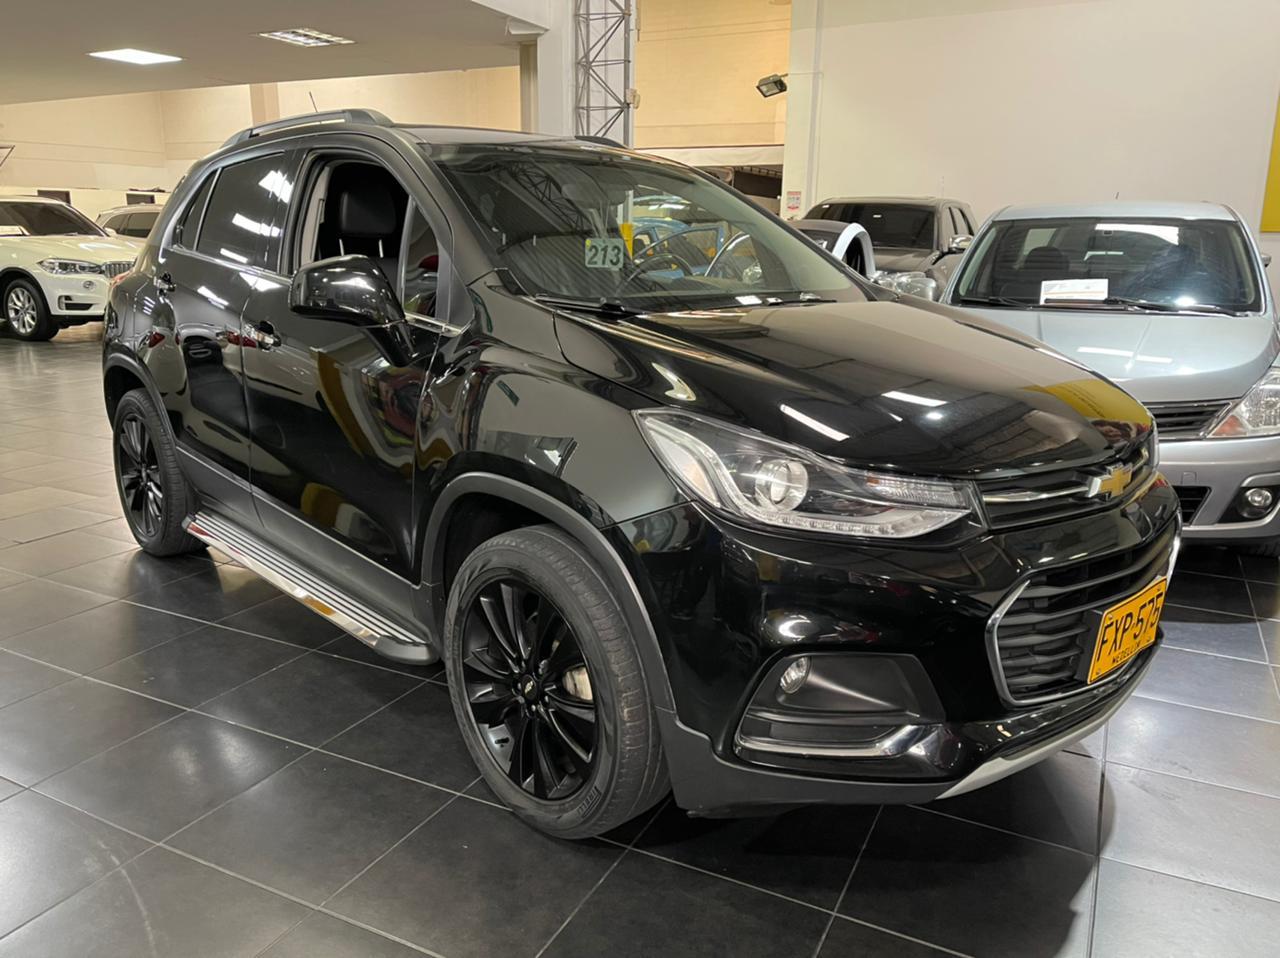 Chevrolet-Tracker-01411397-1